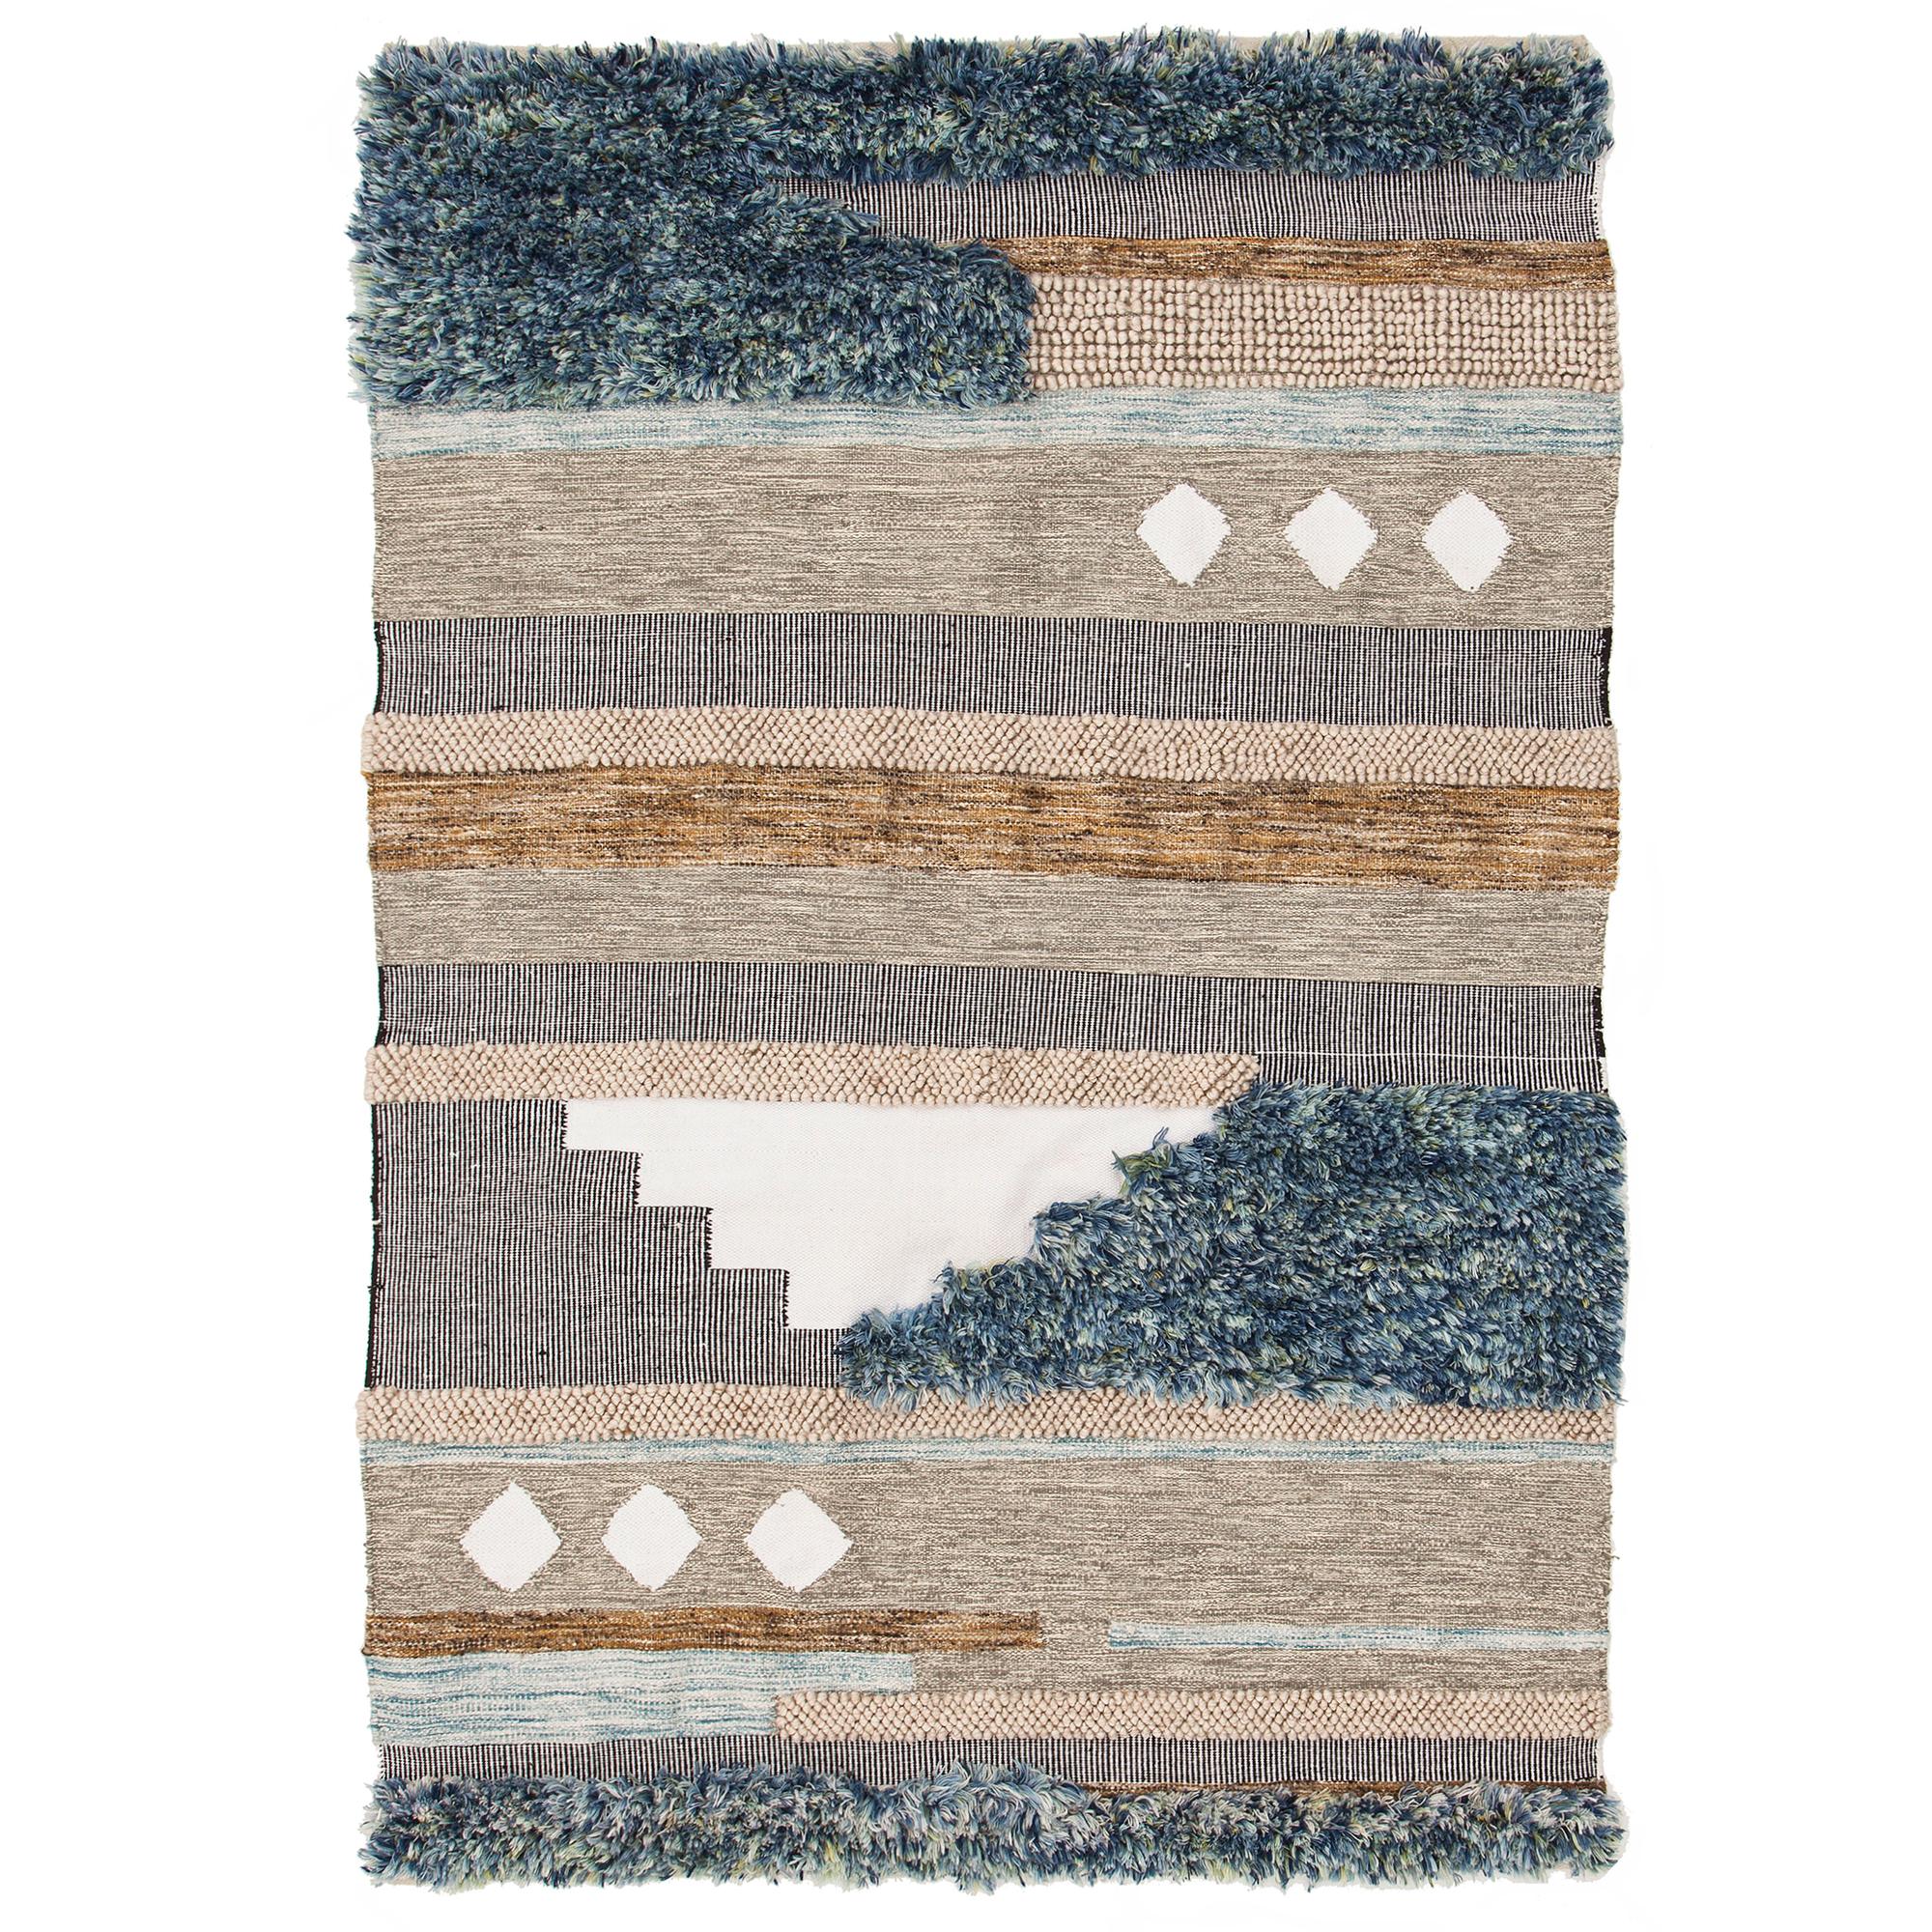 il pastel runner rugaztec turkish rug p fullxfull small vintage bohemian oushak aztec fashion